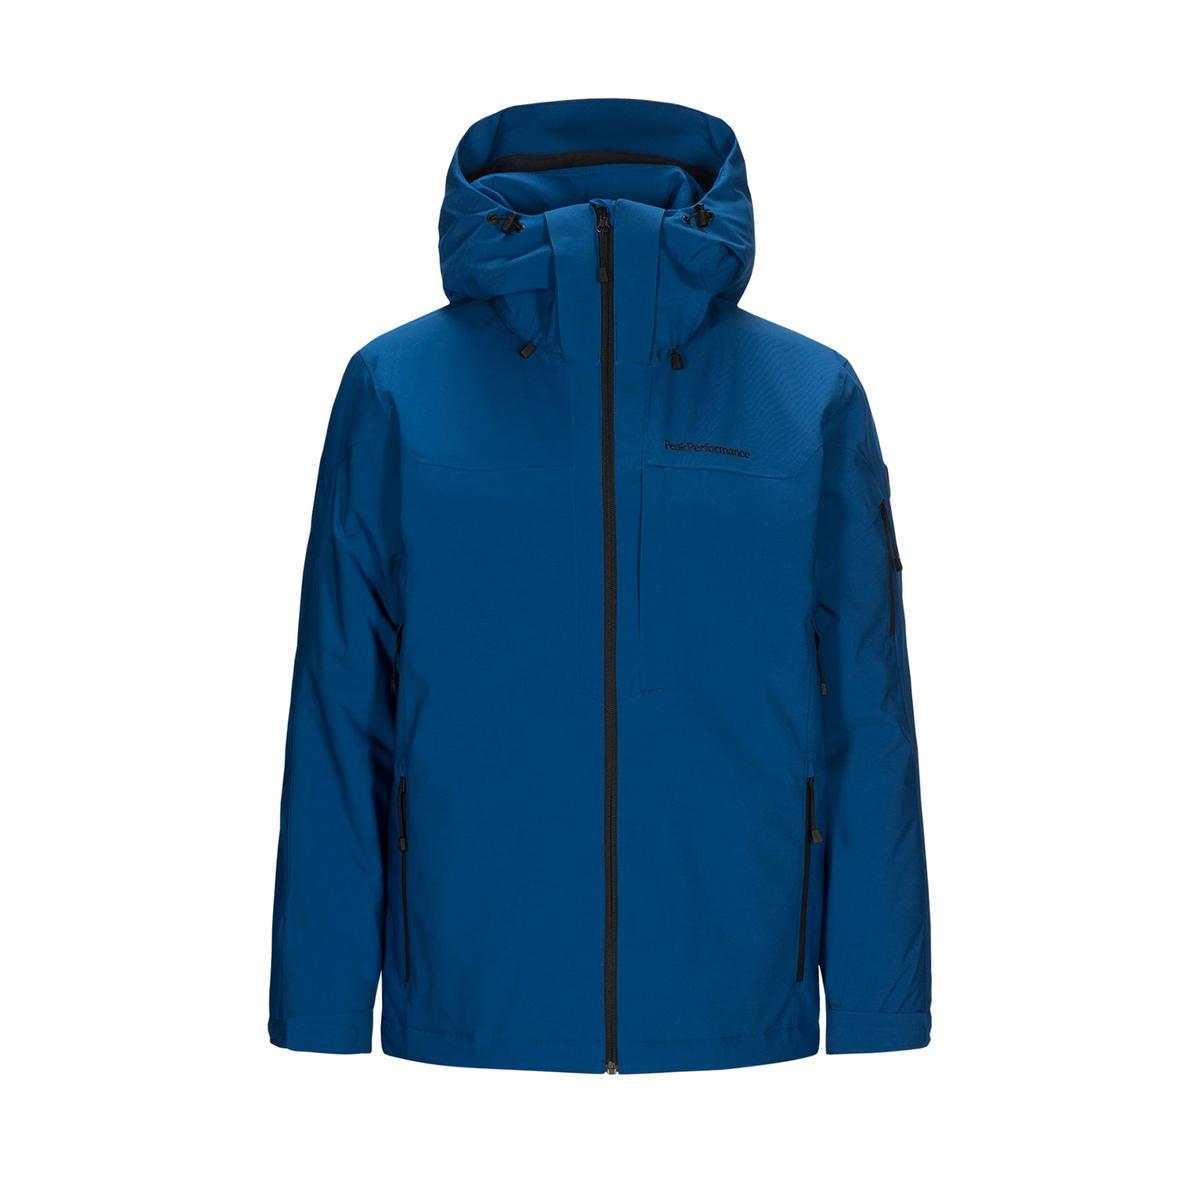 Prezzi Peak performance giacca MAROON